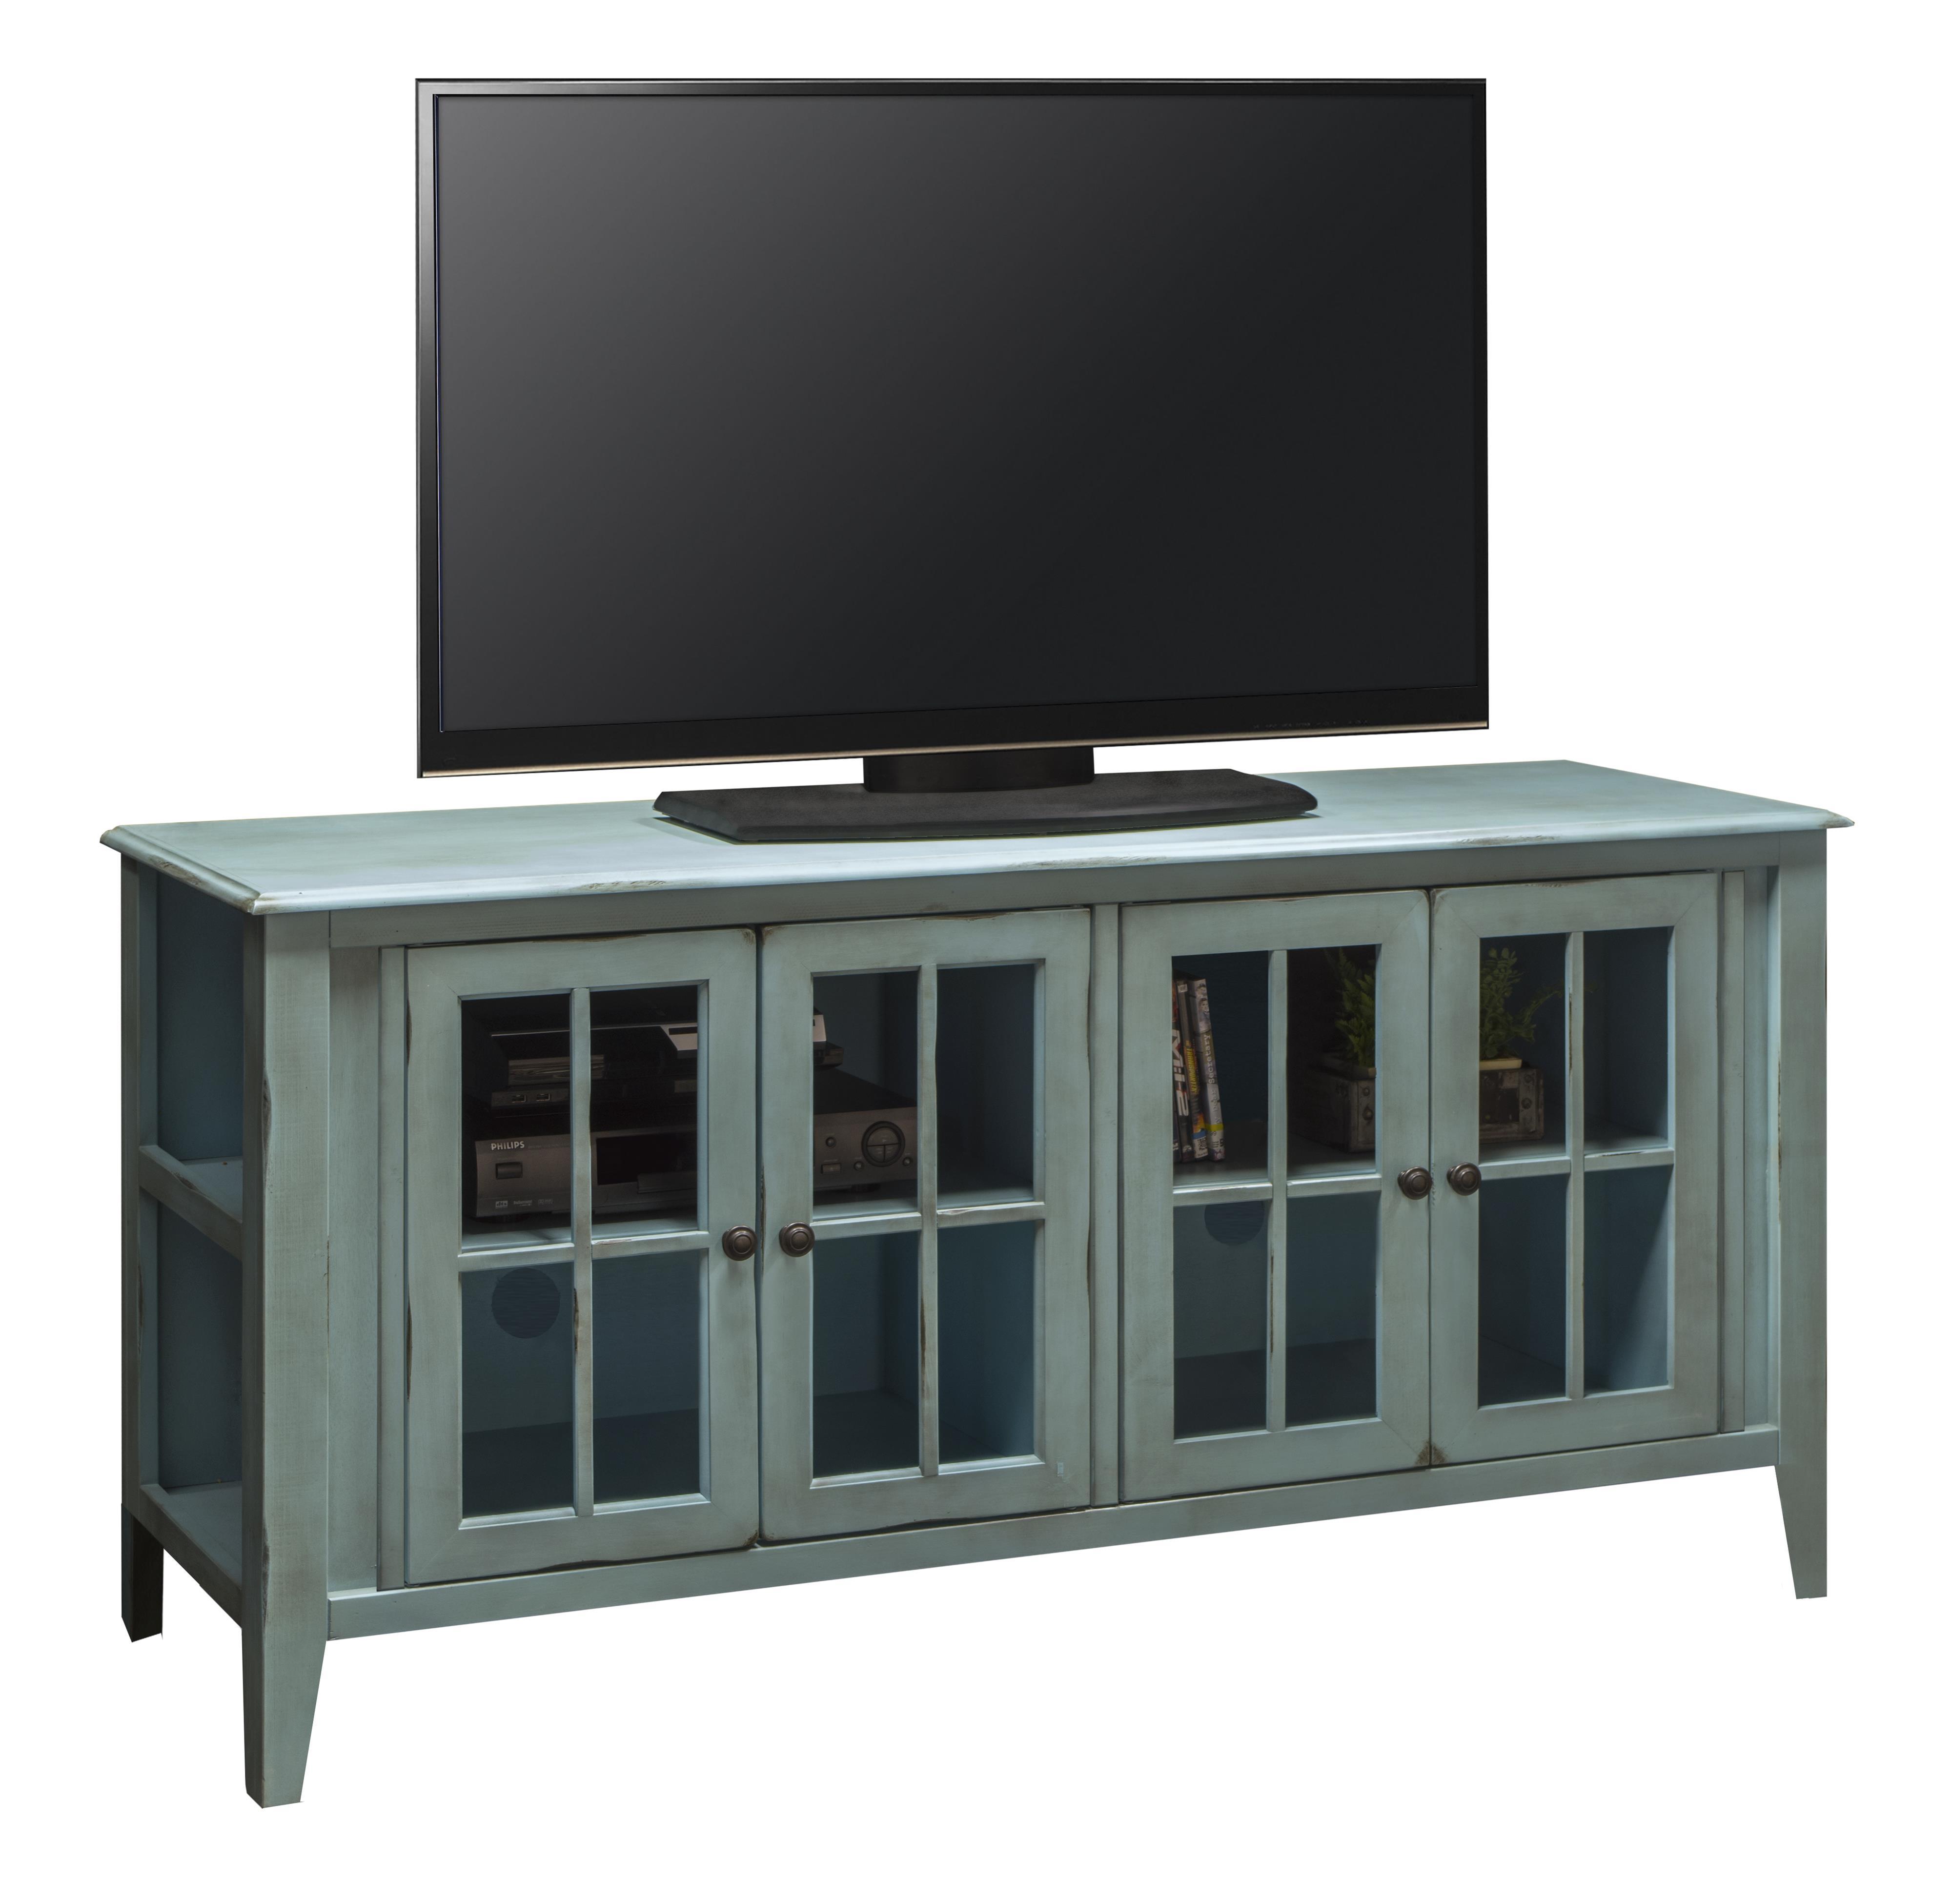 "Legends Furniture Calistoga Collection Calistoga 64"" TV Console - Item Number: CA1251-RBL"